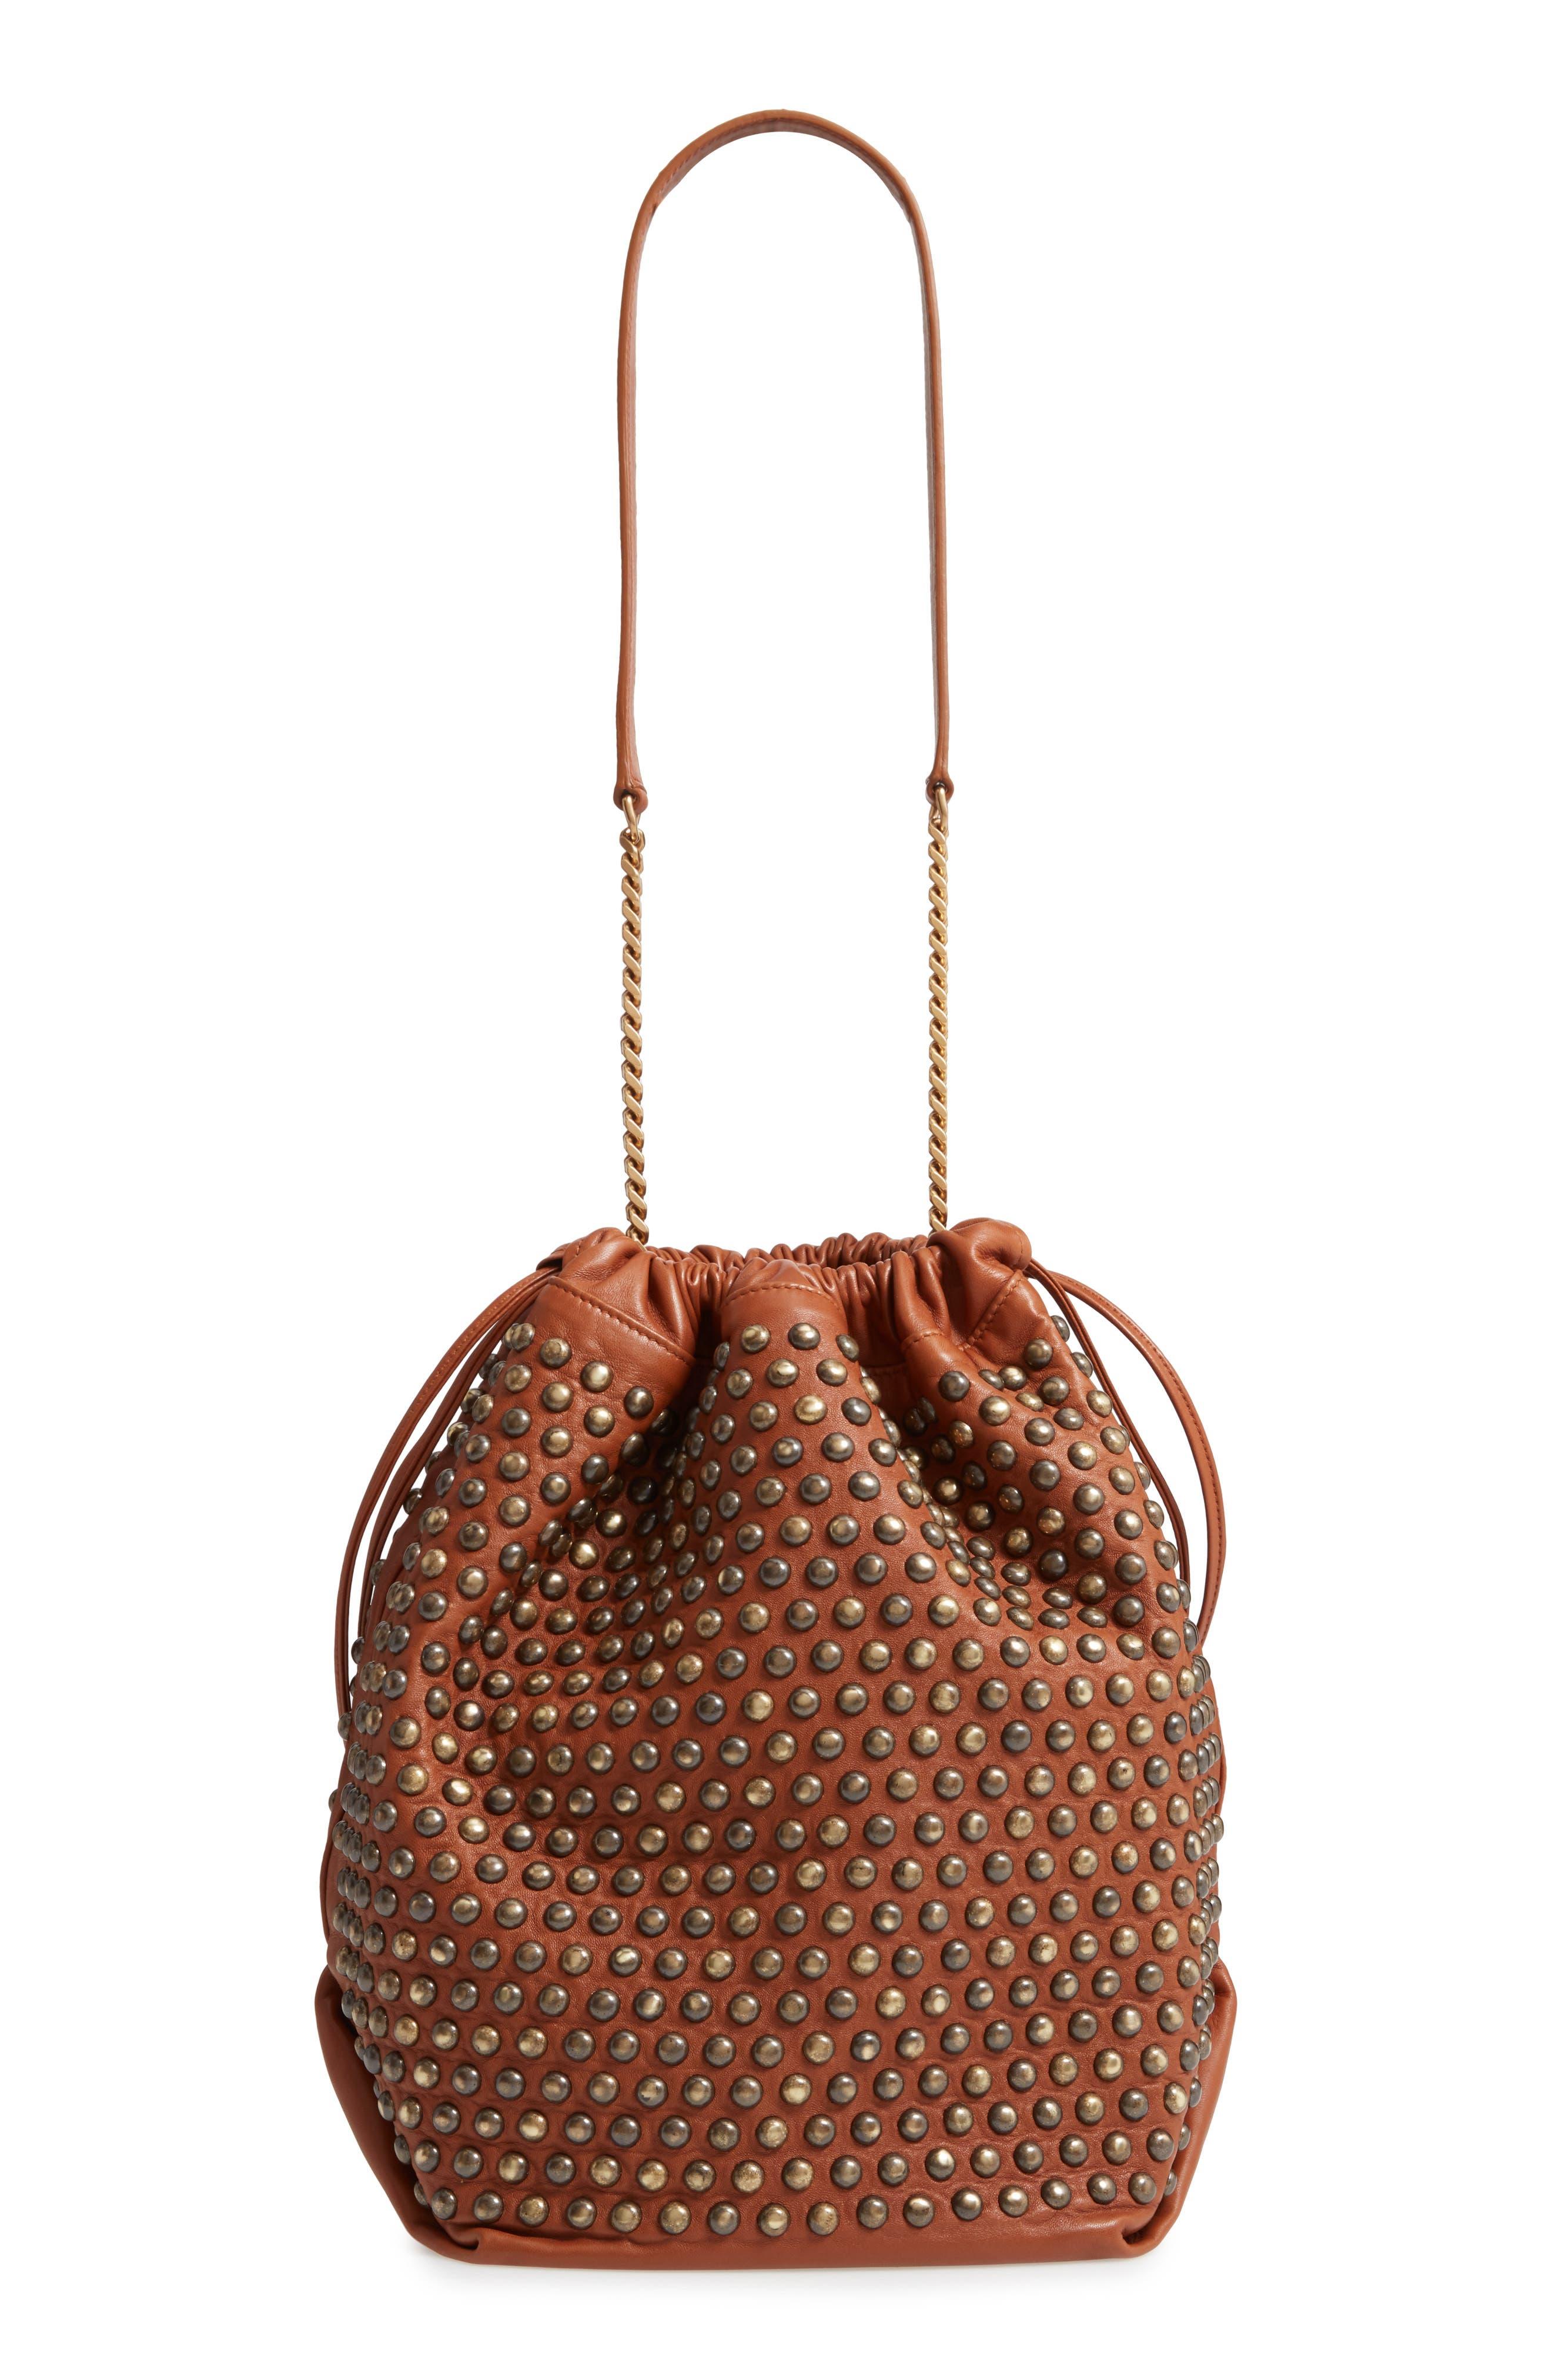 SAINT LAURENT, Teddy Studded Leather Bucket Bag, Alternate thumbnail 3, color, 200